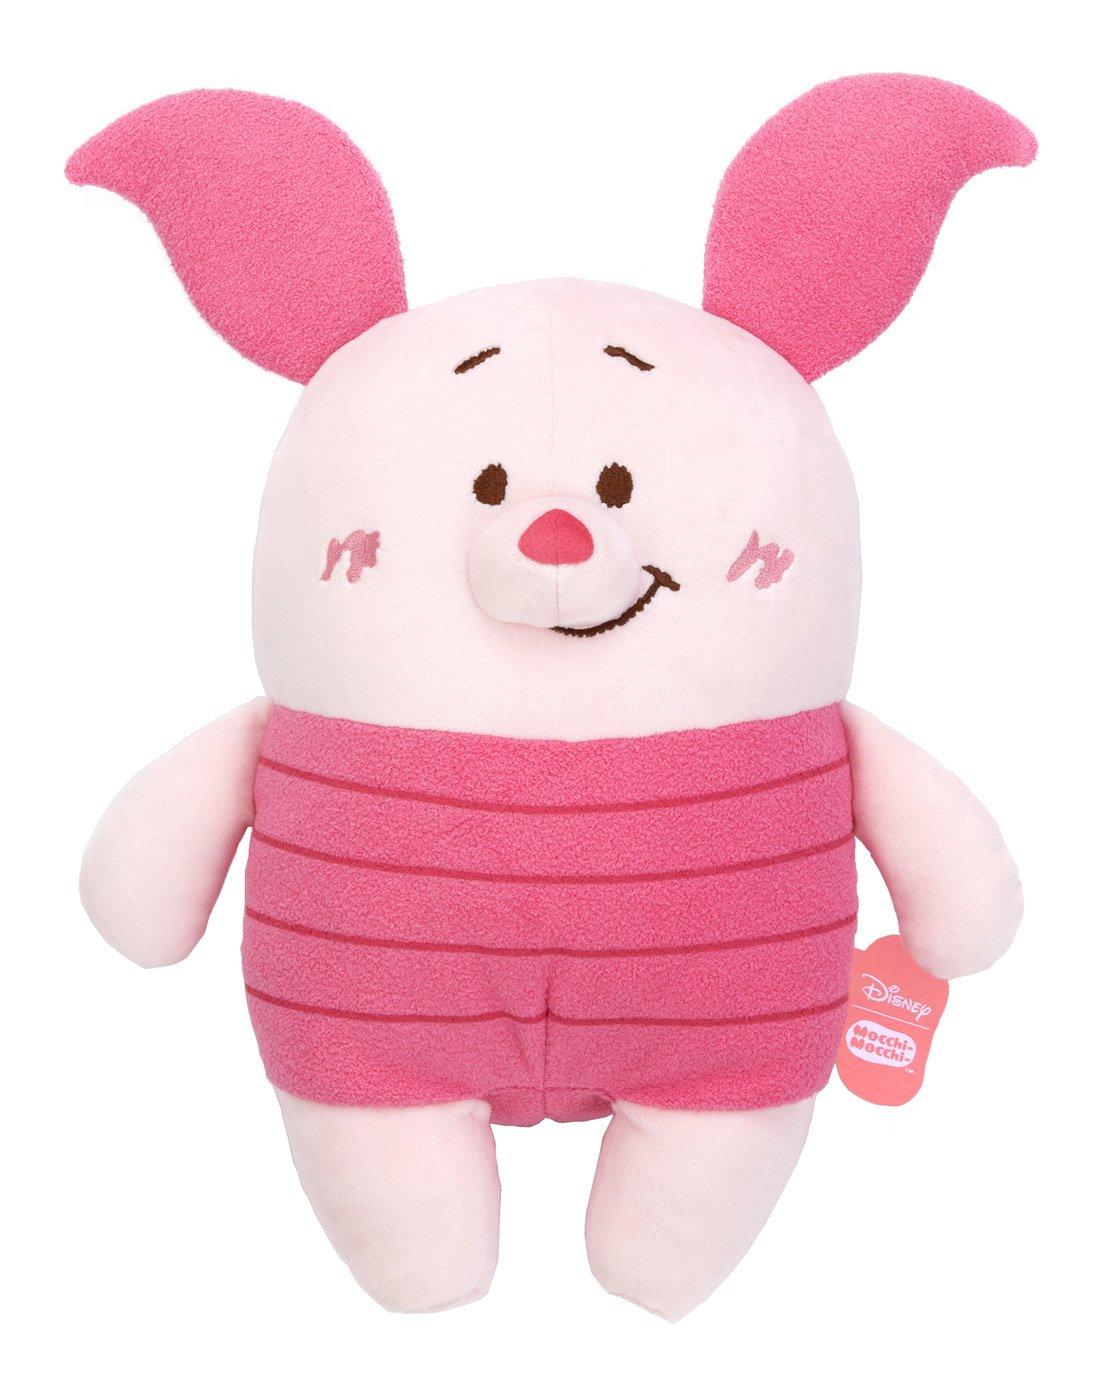 White Plush Doll M Minnie Mouse Disney Mocchi-Mocchi Sitting height 44 cm